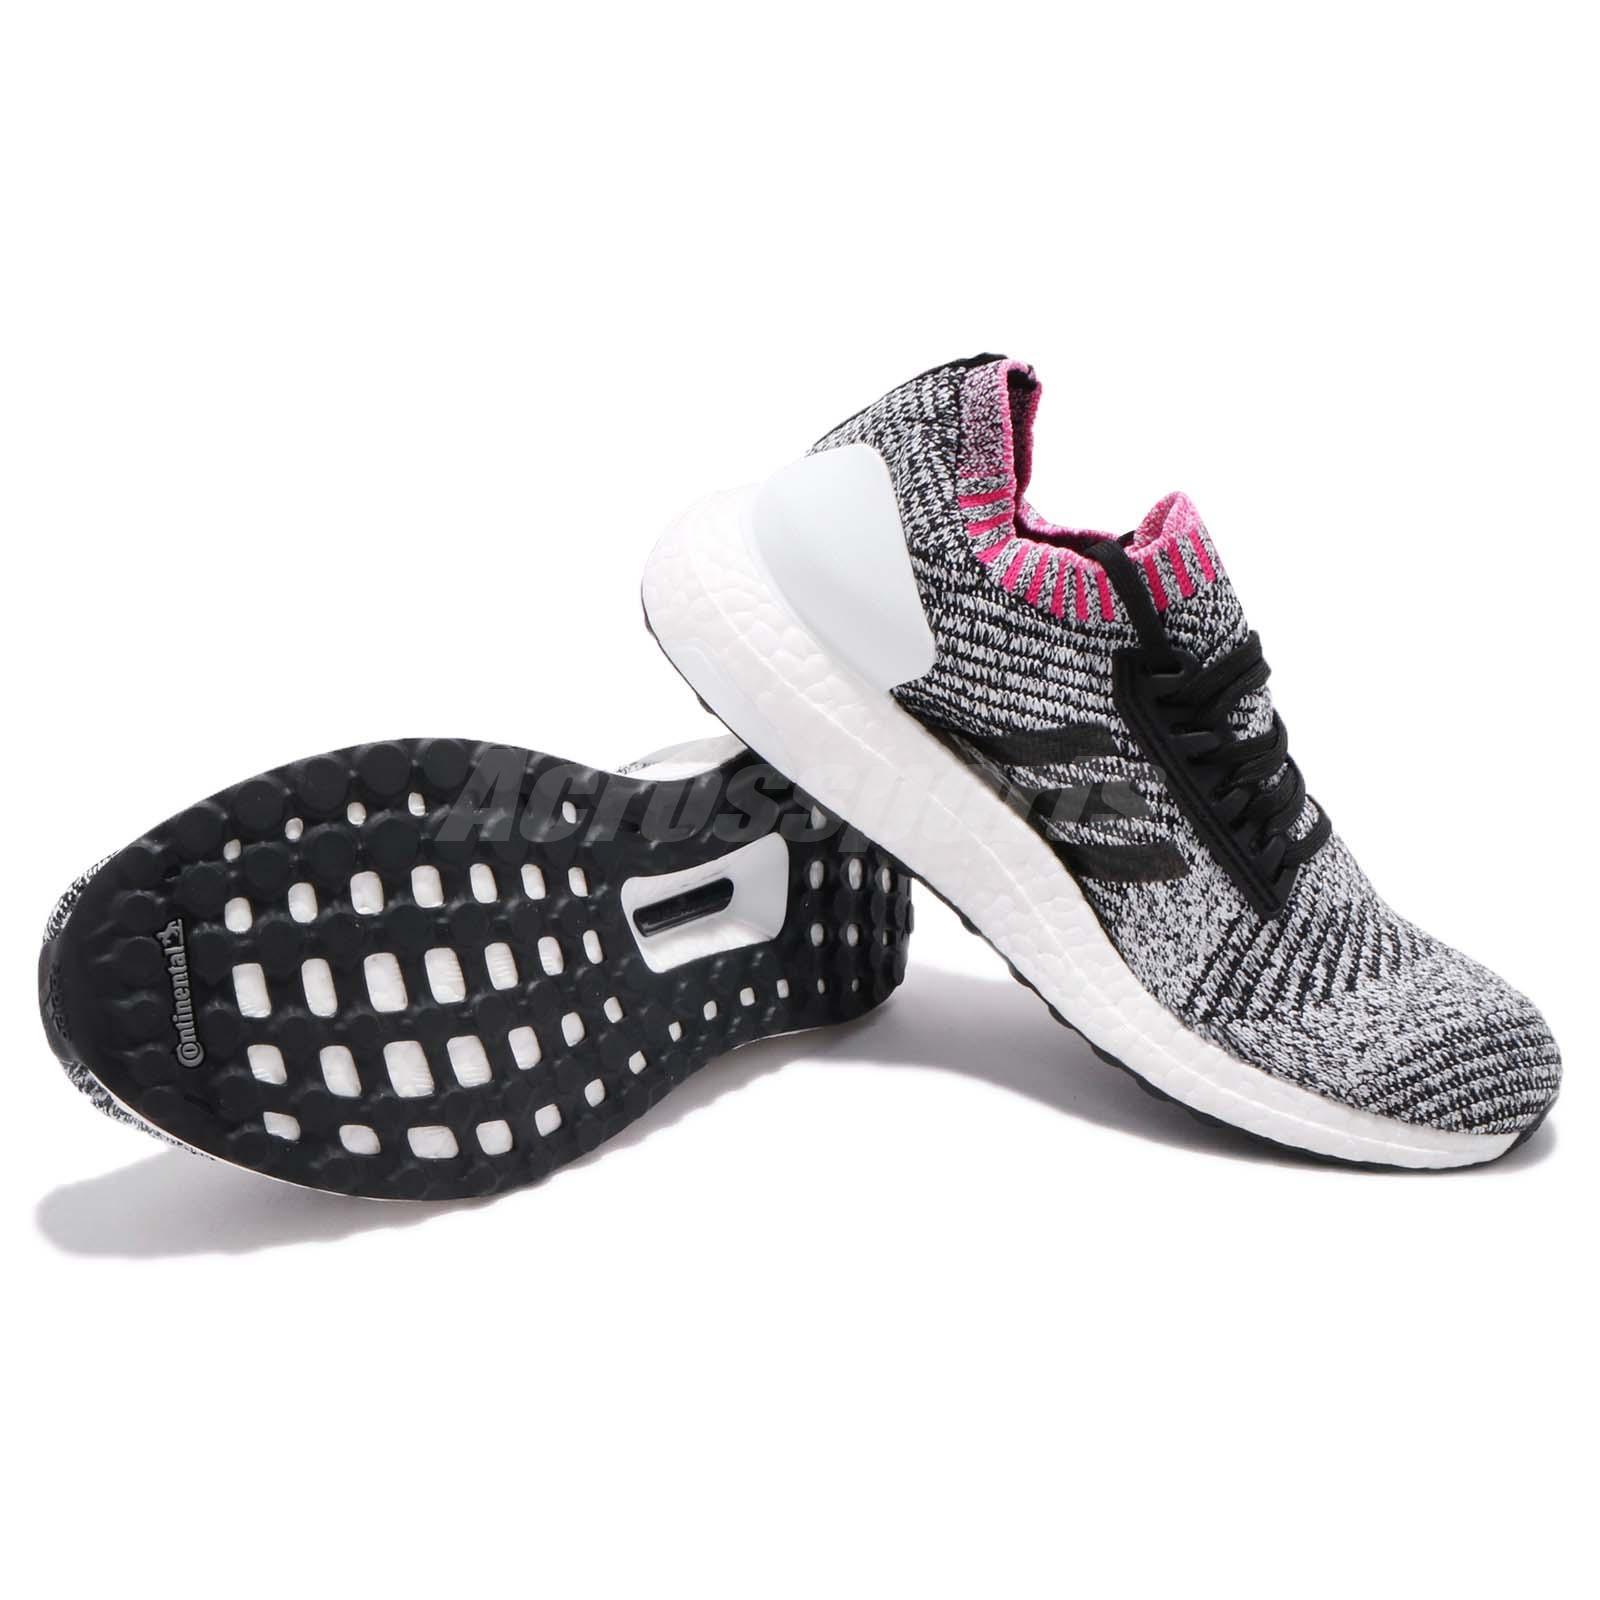 bb7609c8744 adidas UltraBOOST X White Black Shock Pink Women Running Shoes ...